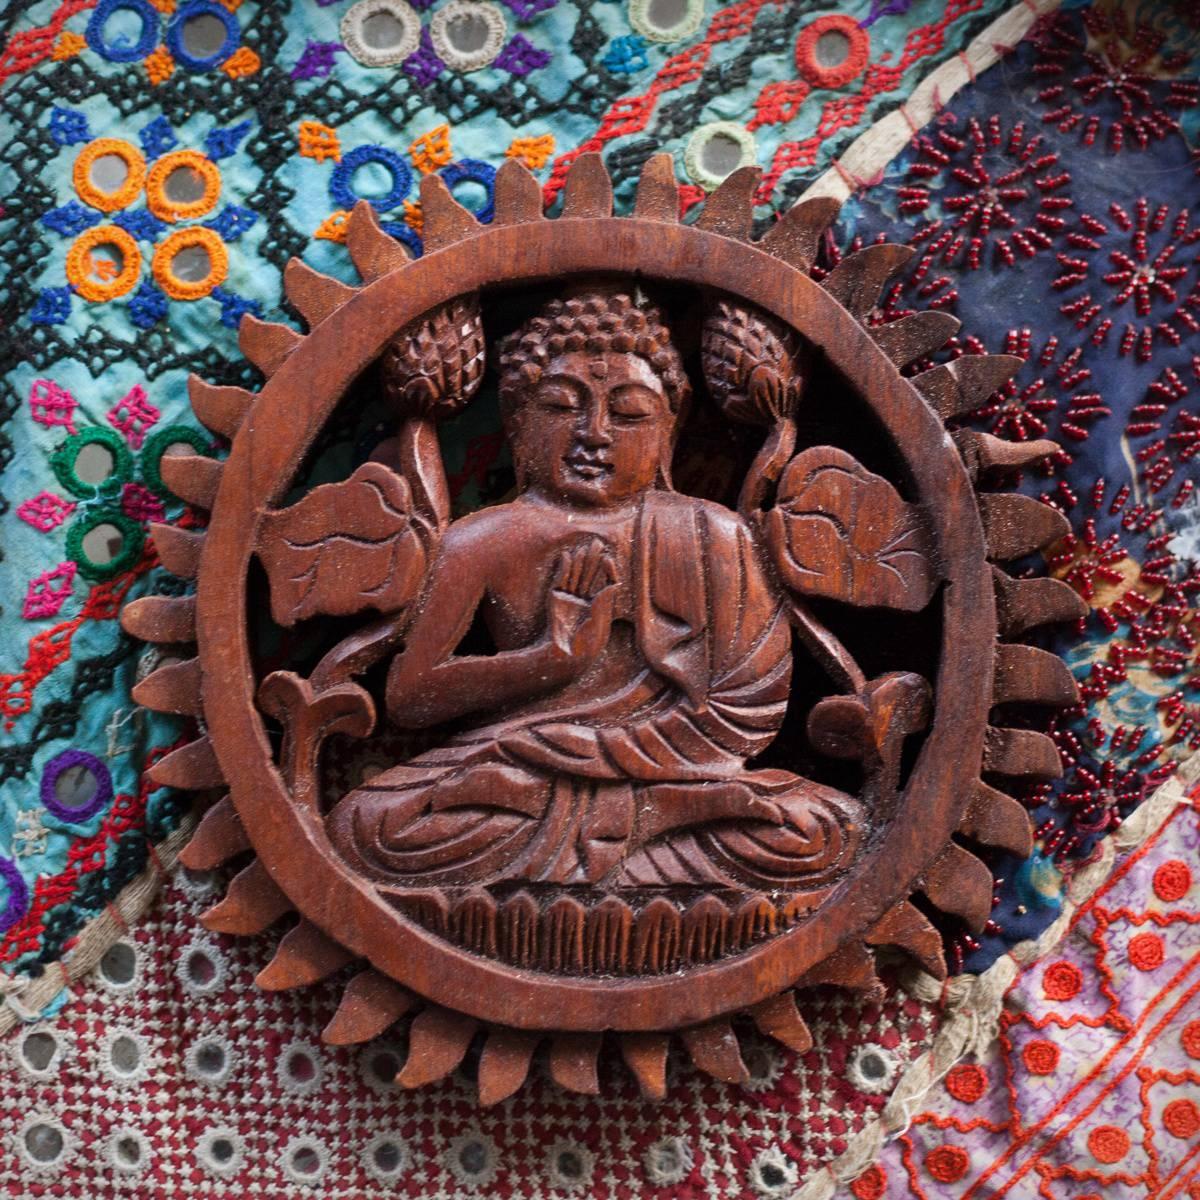 Wooden_Suns_Buddha_3of6_6_27